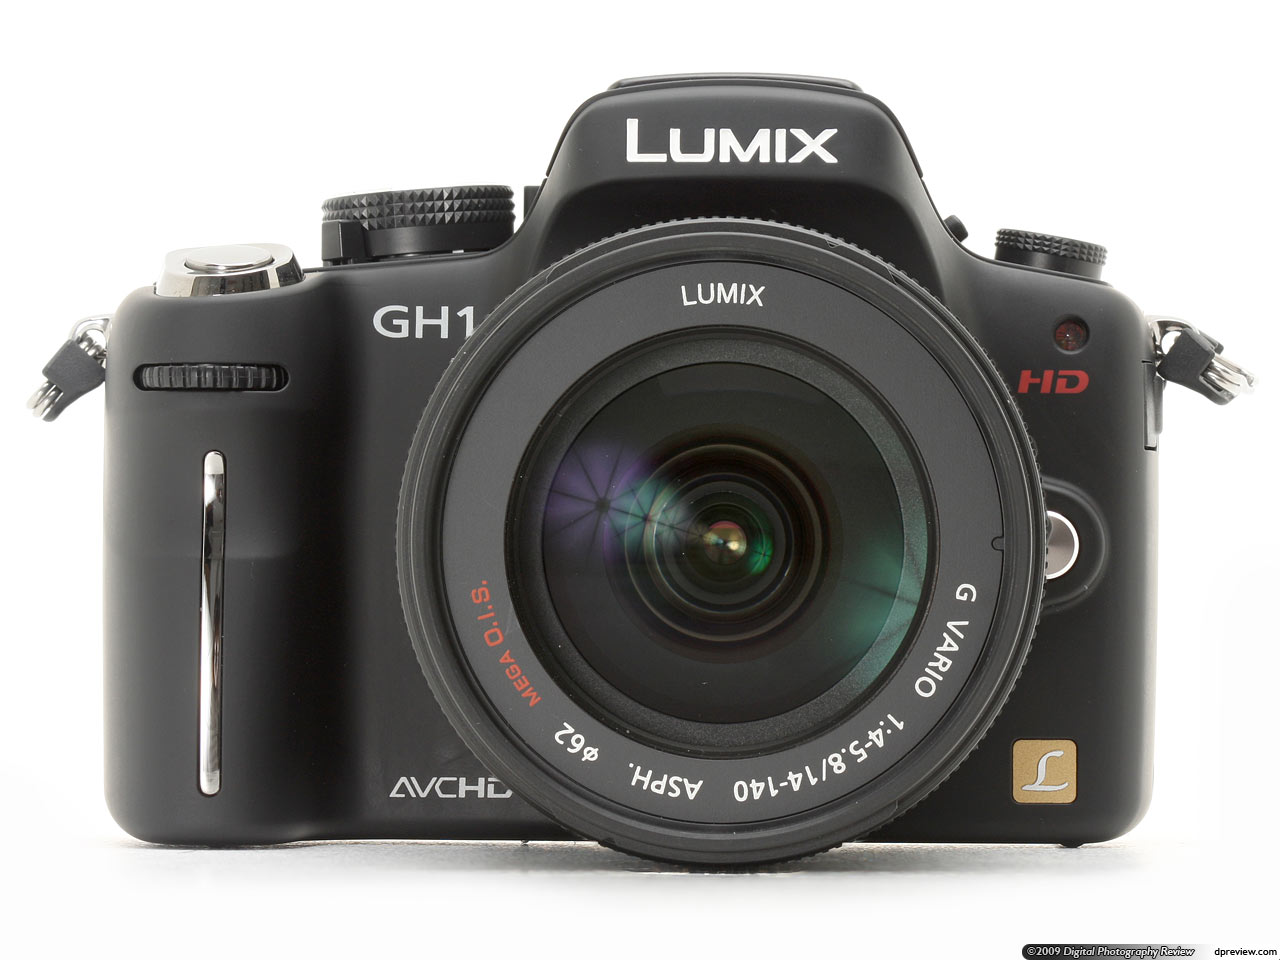 panasonic lumix dmc gh1 review digital photography review rh dpreview com panasonic gh1 user manual pdf Panasonic Lumix DMC-FP1